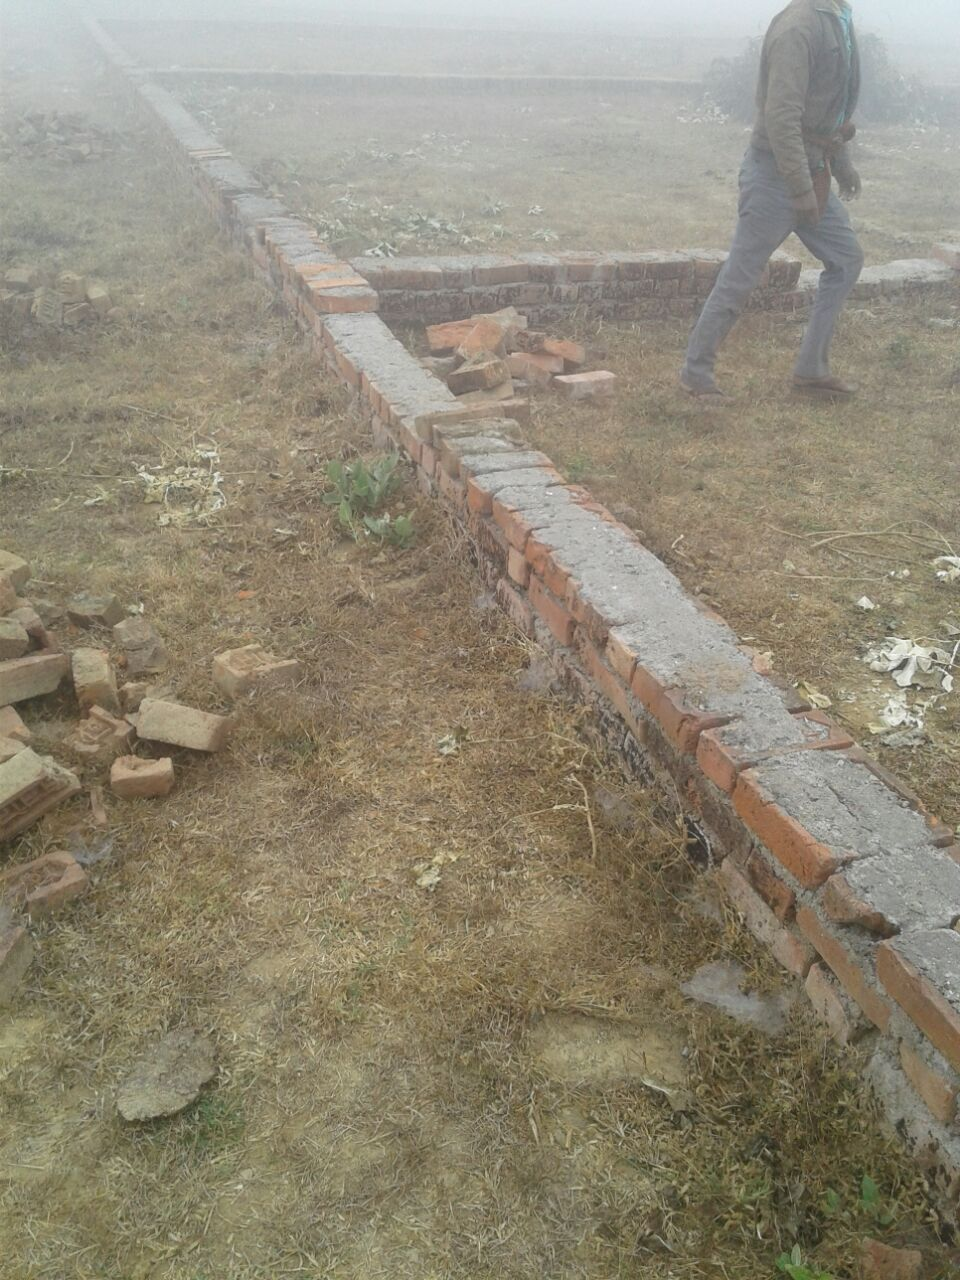 Residental Corner Plot Main Highway Masik Kiston Par Bhi Or Full Payment Pe